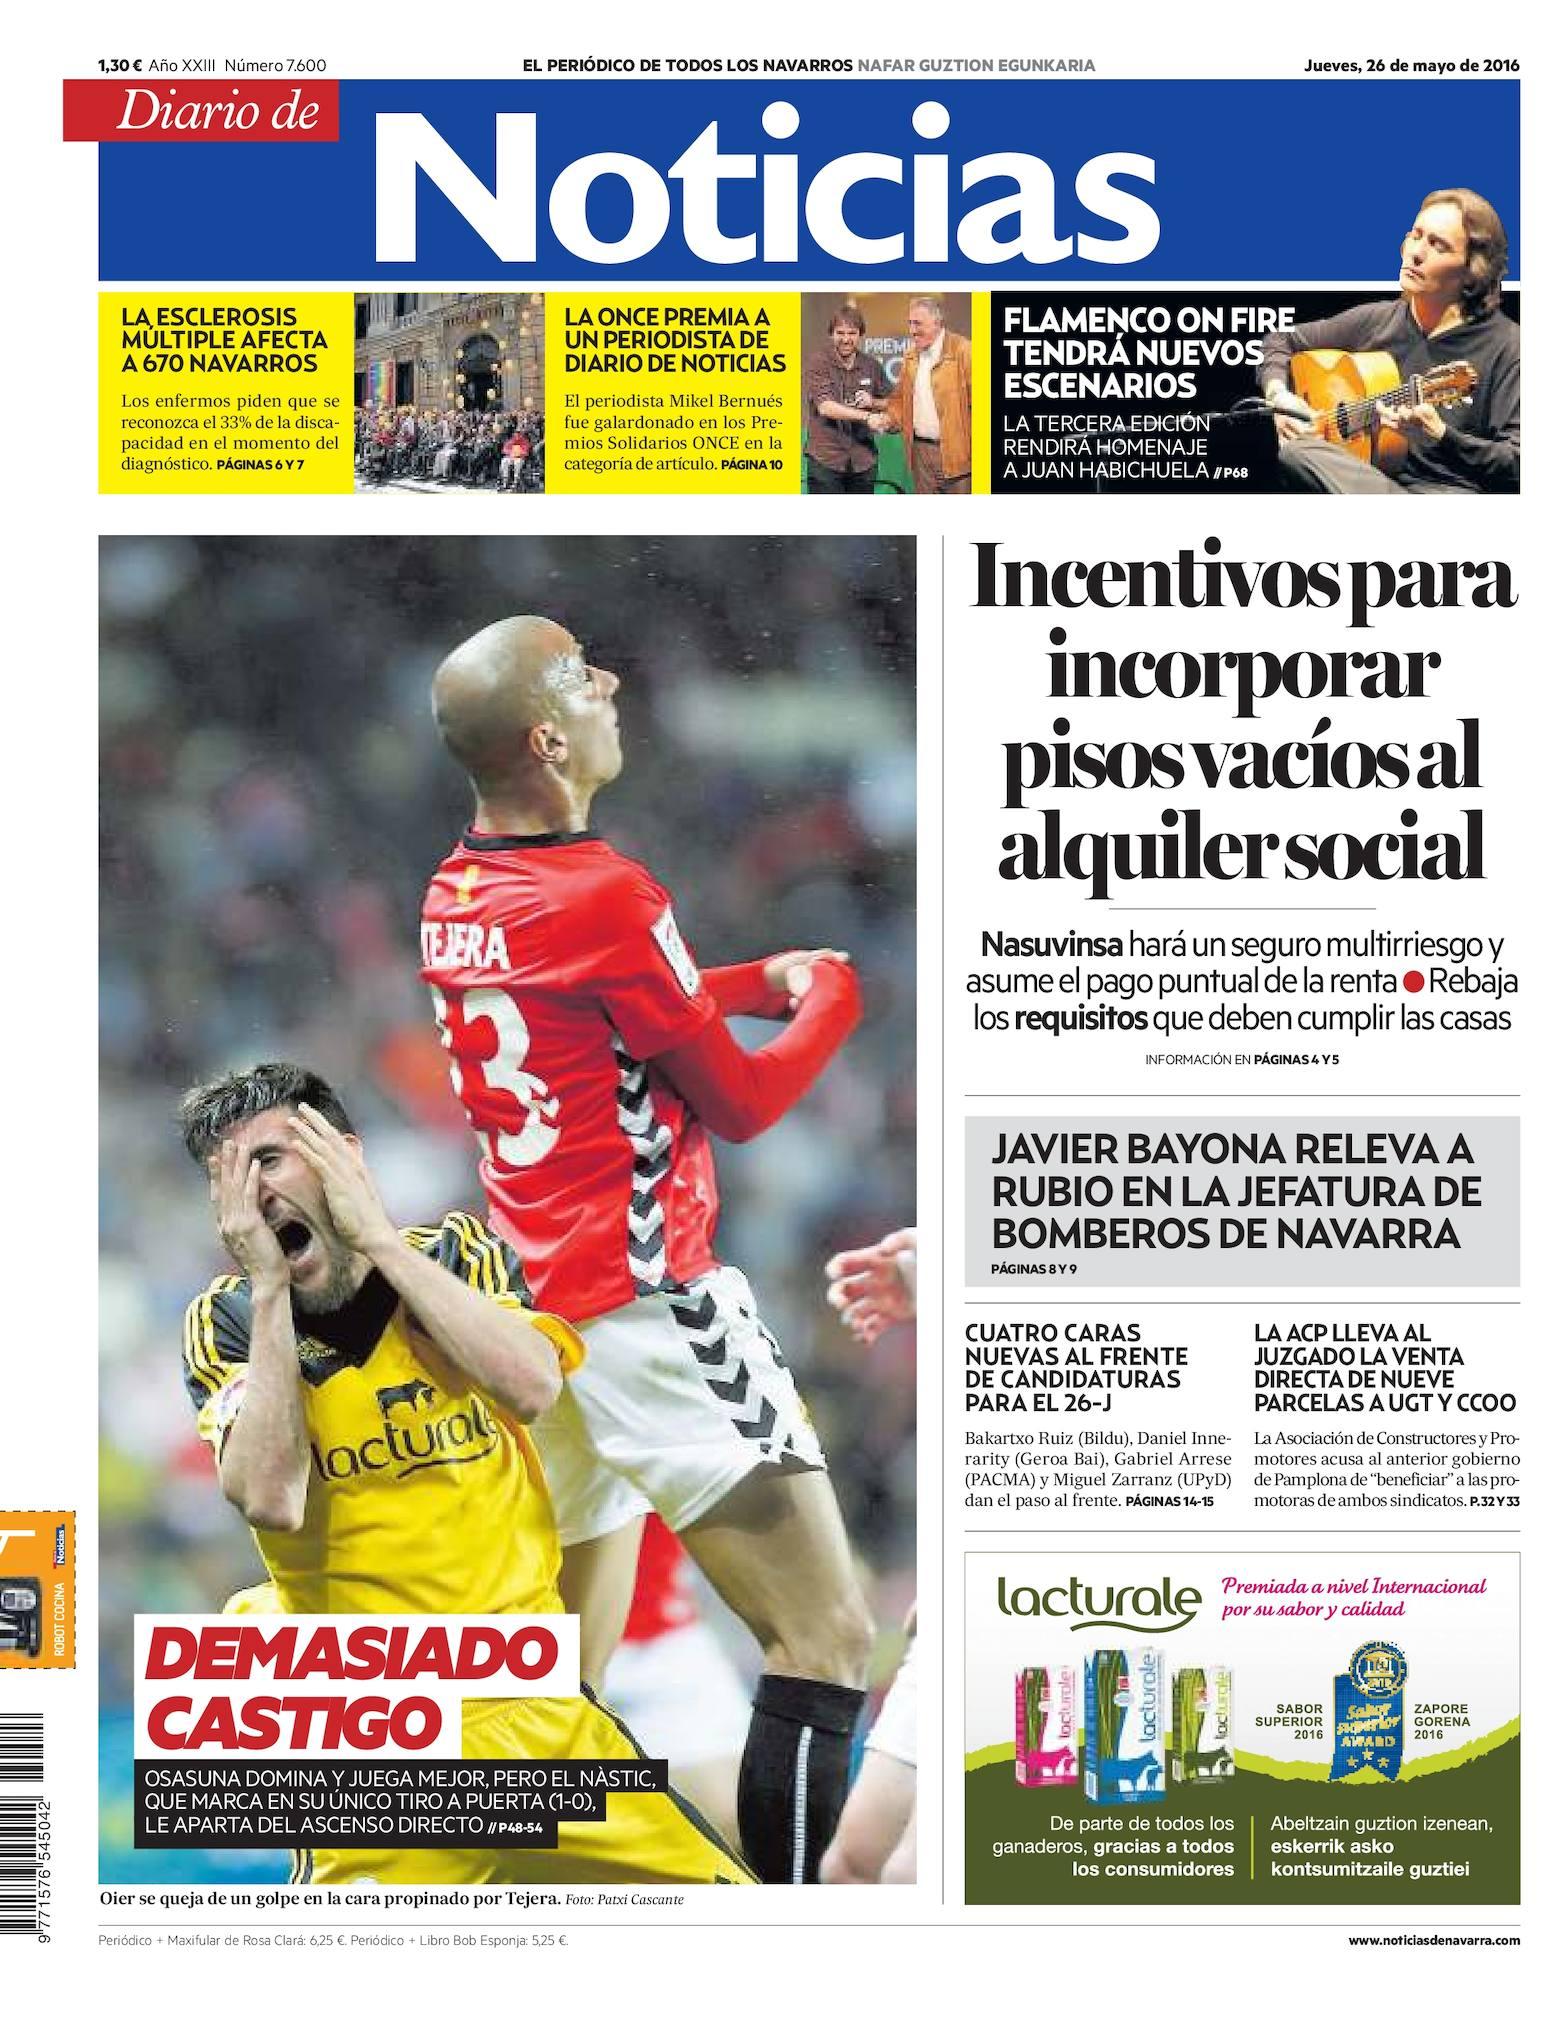 Calaméo - Diario de Noticias 20160526 937520ca00f85